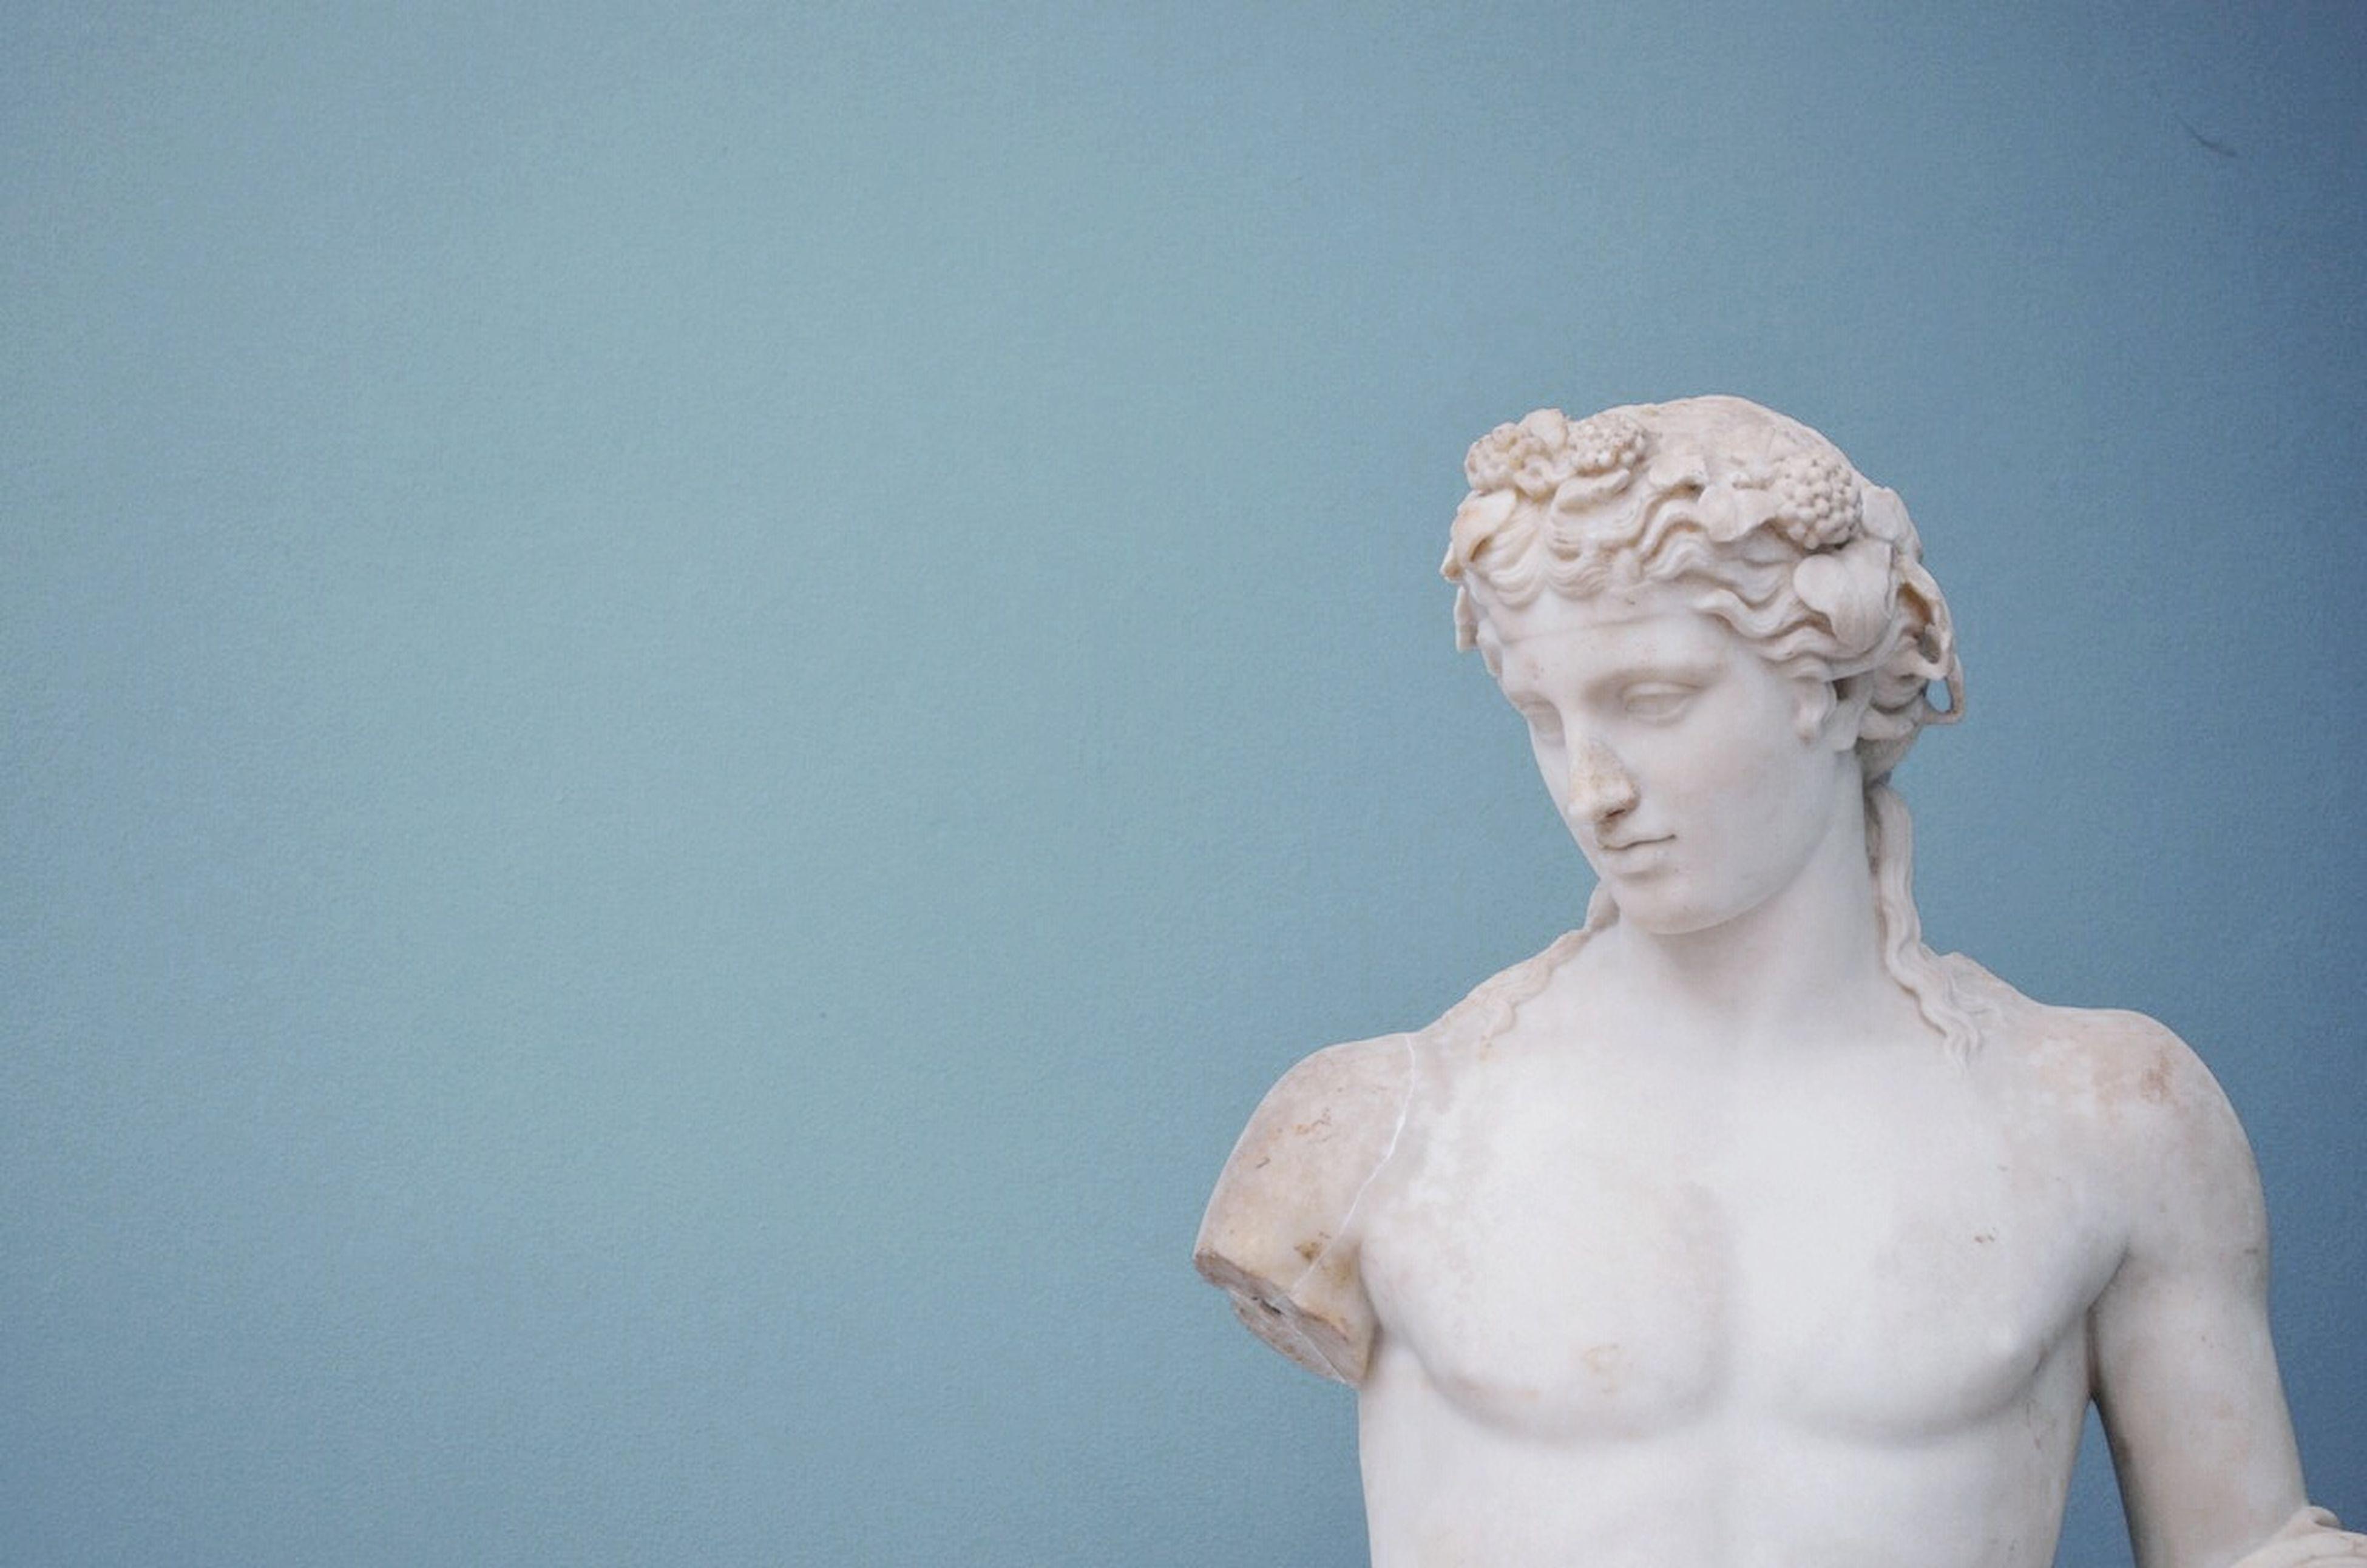 Artsy Fartsy Art Sculpture He Looks Like Our Neighbor David Lol Greek